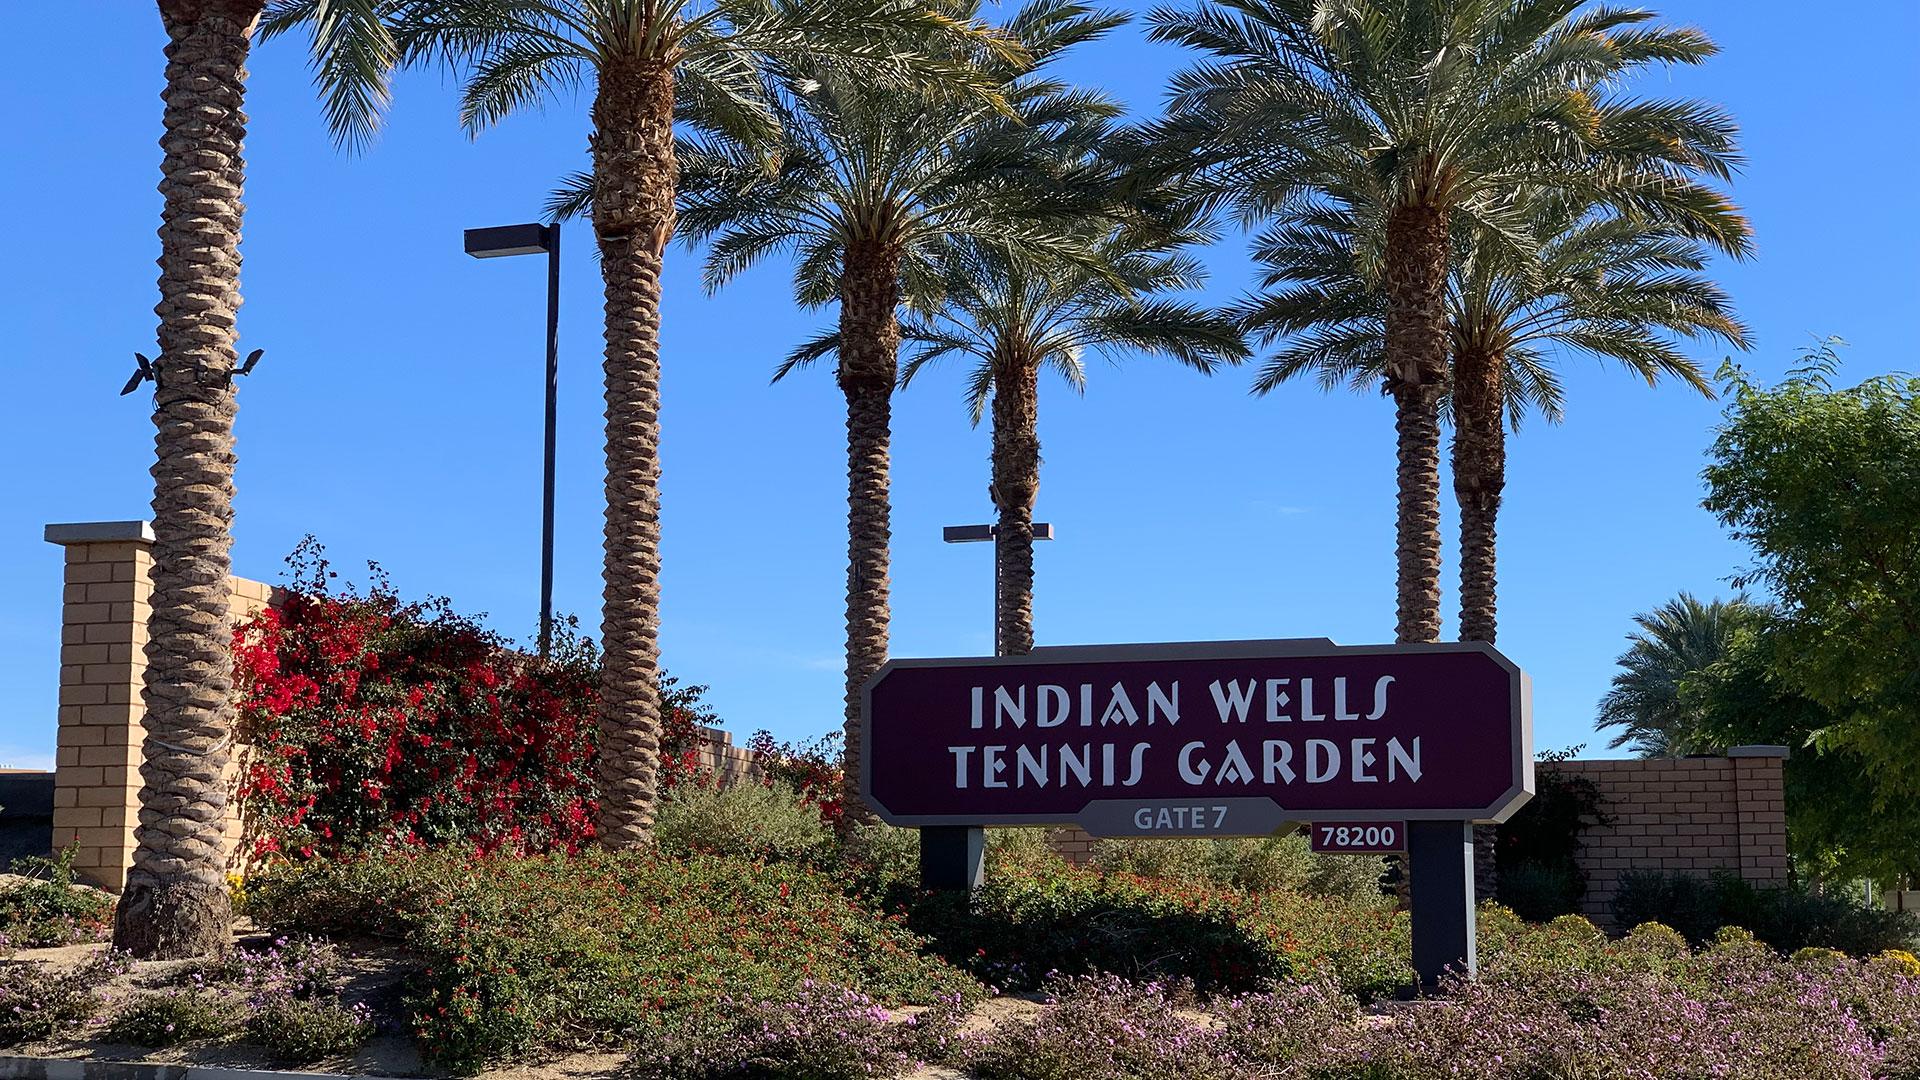 Indian Wells Entrance Gate 7